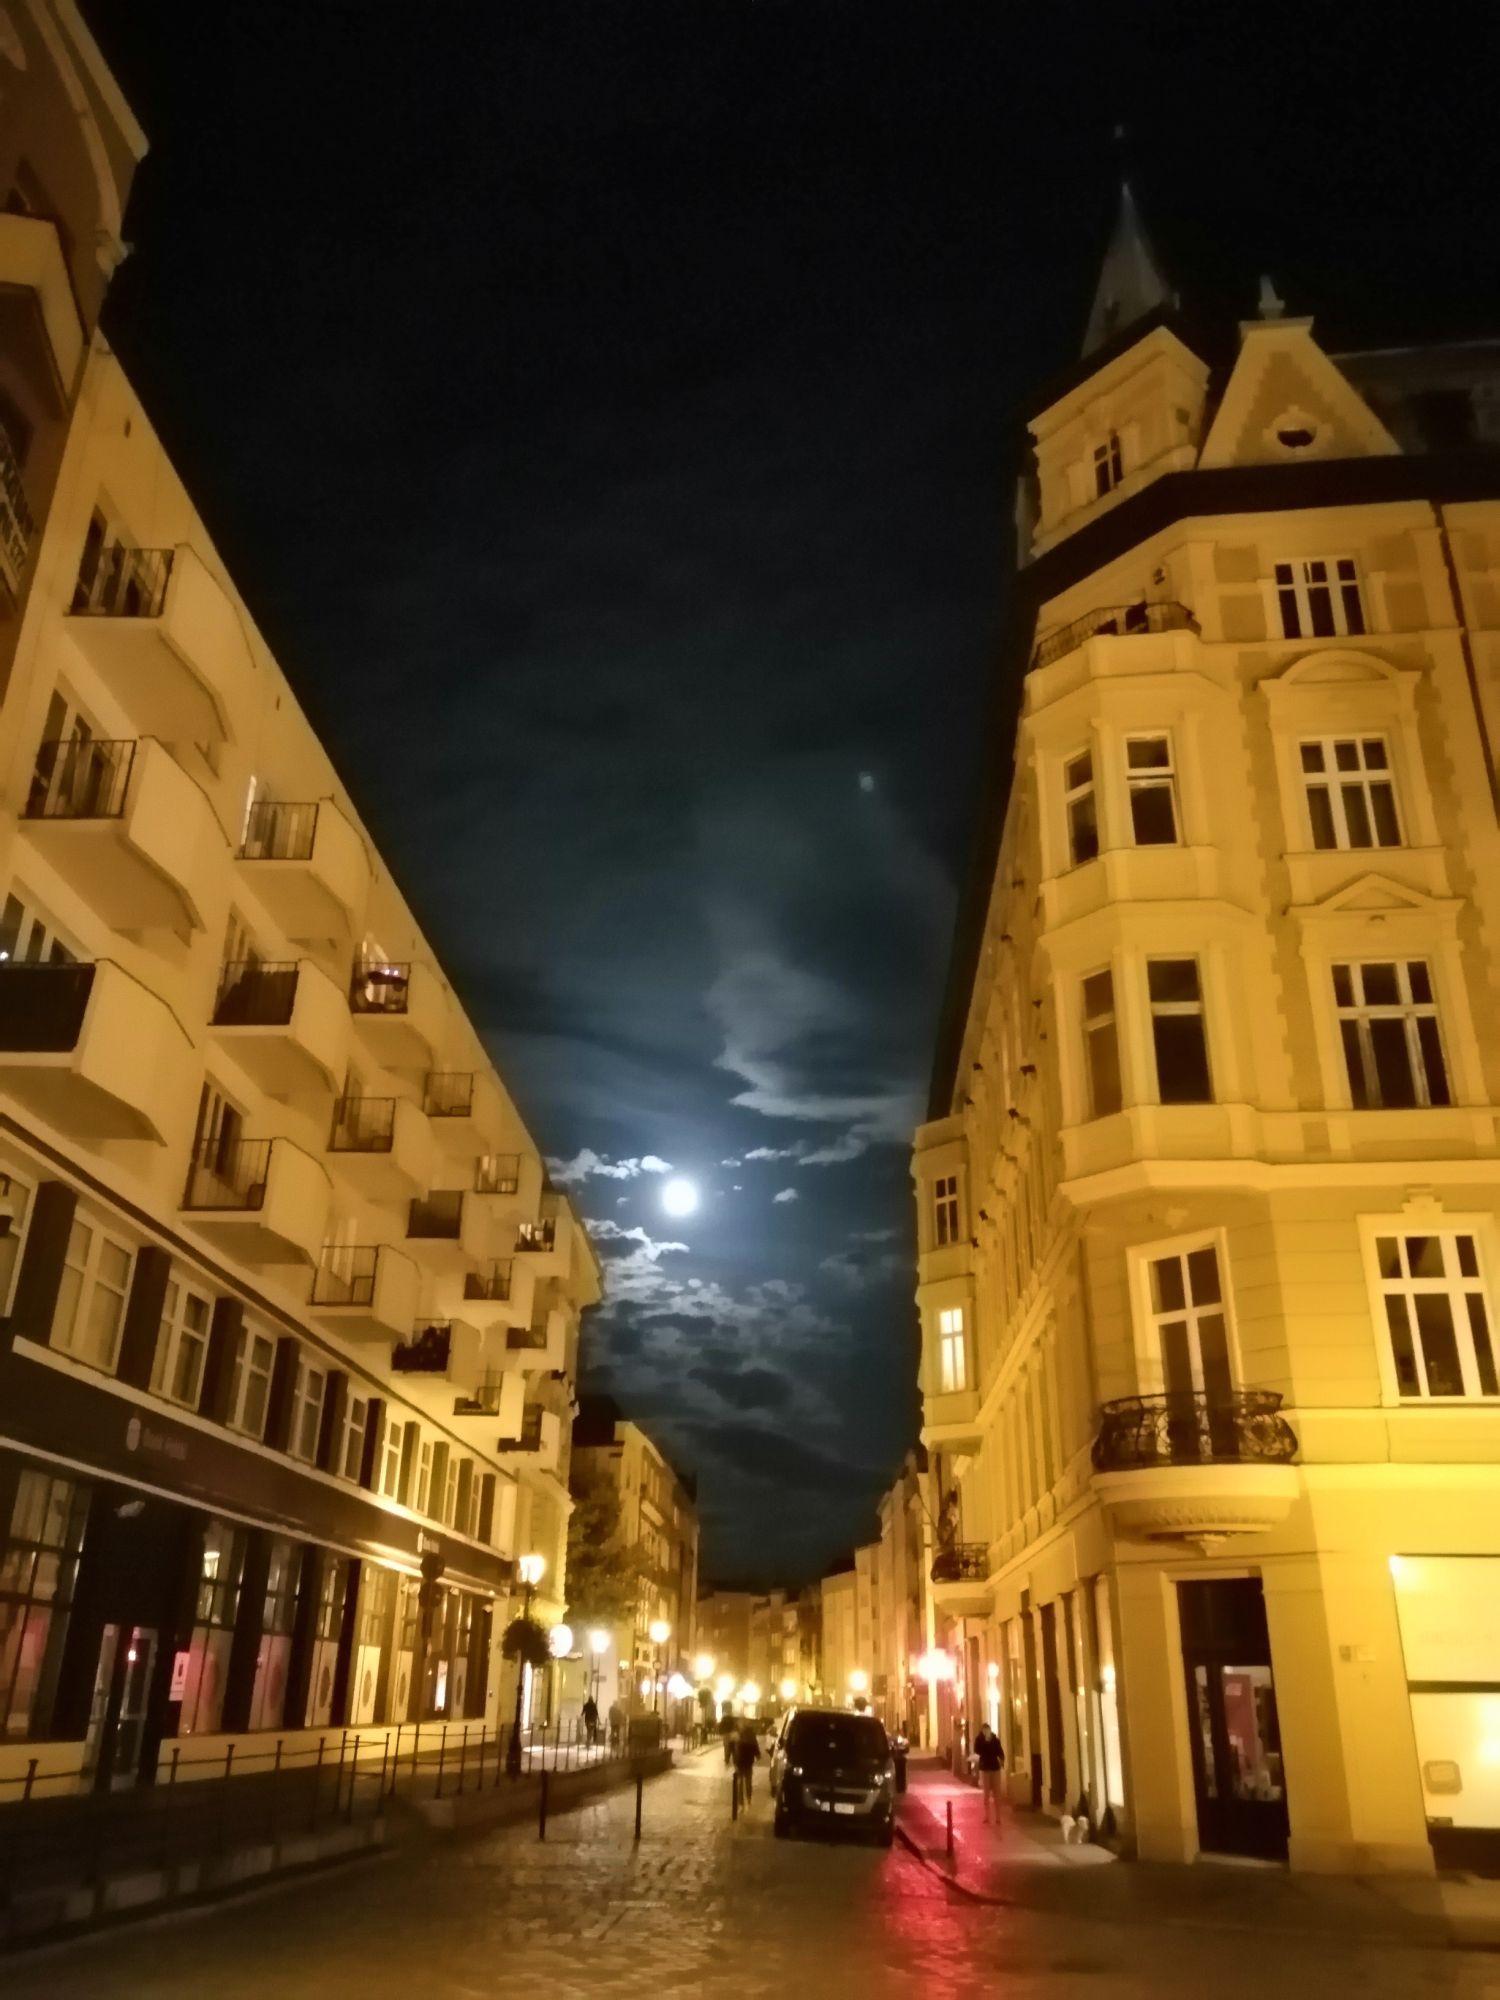 Świdnicki rynek,13 październik 2019, fot. Mateusz Curyl